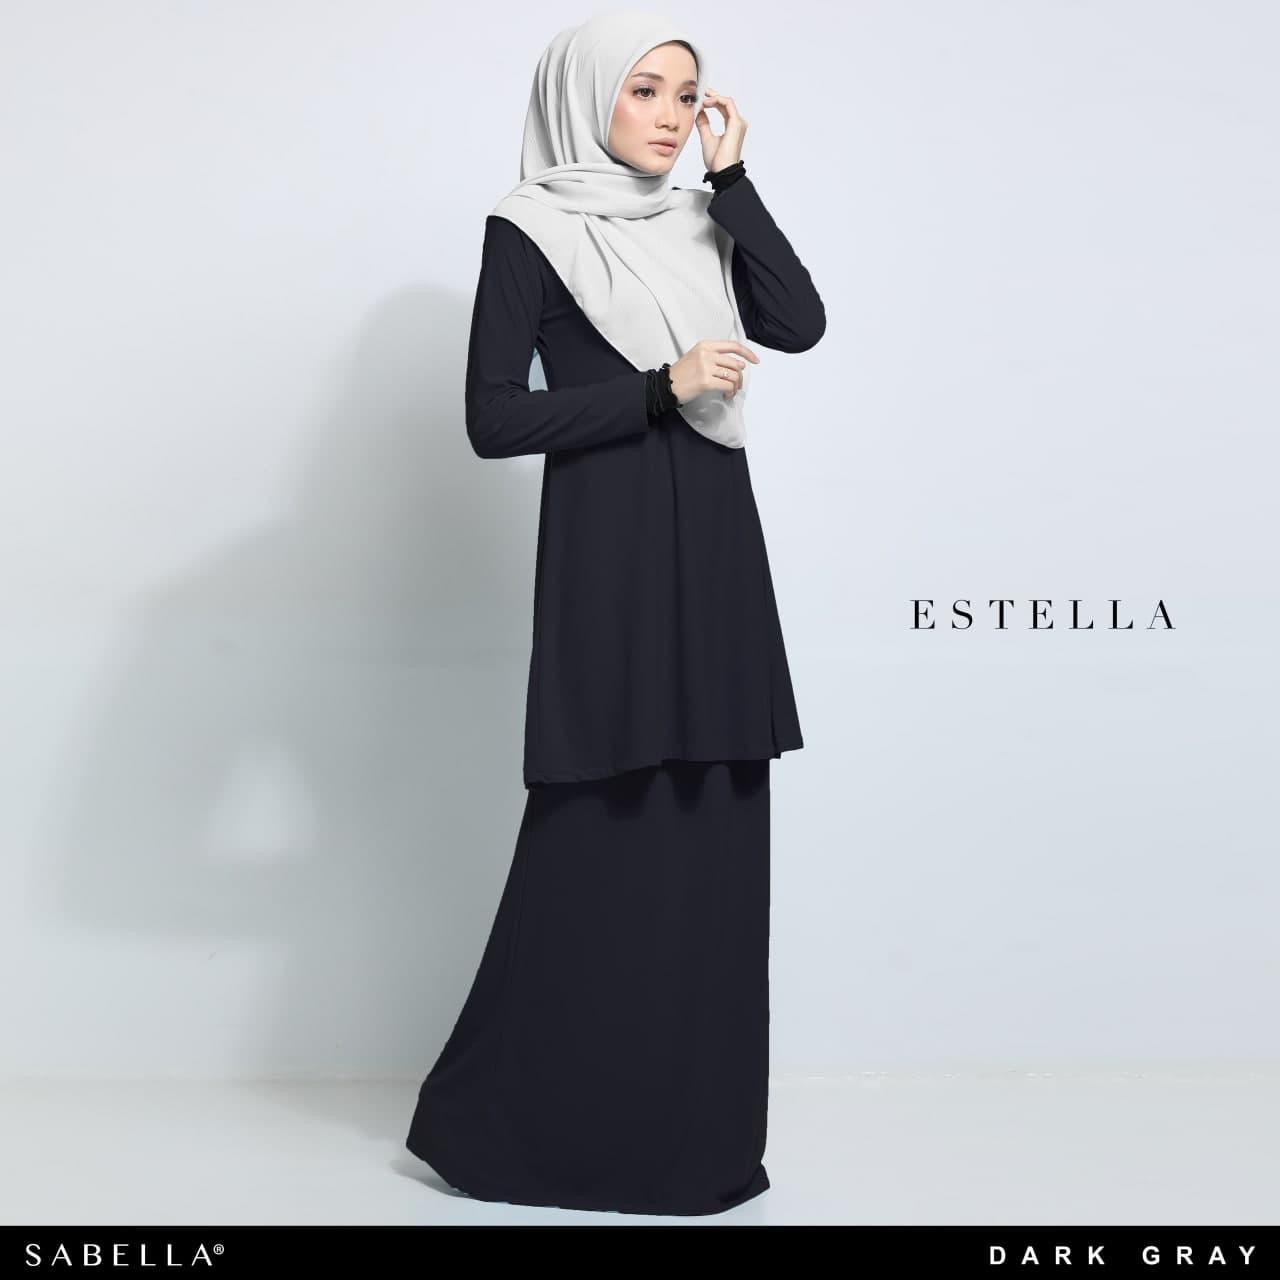 Estella 2.0 Dark Gray